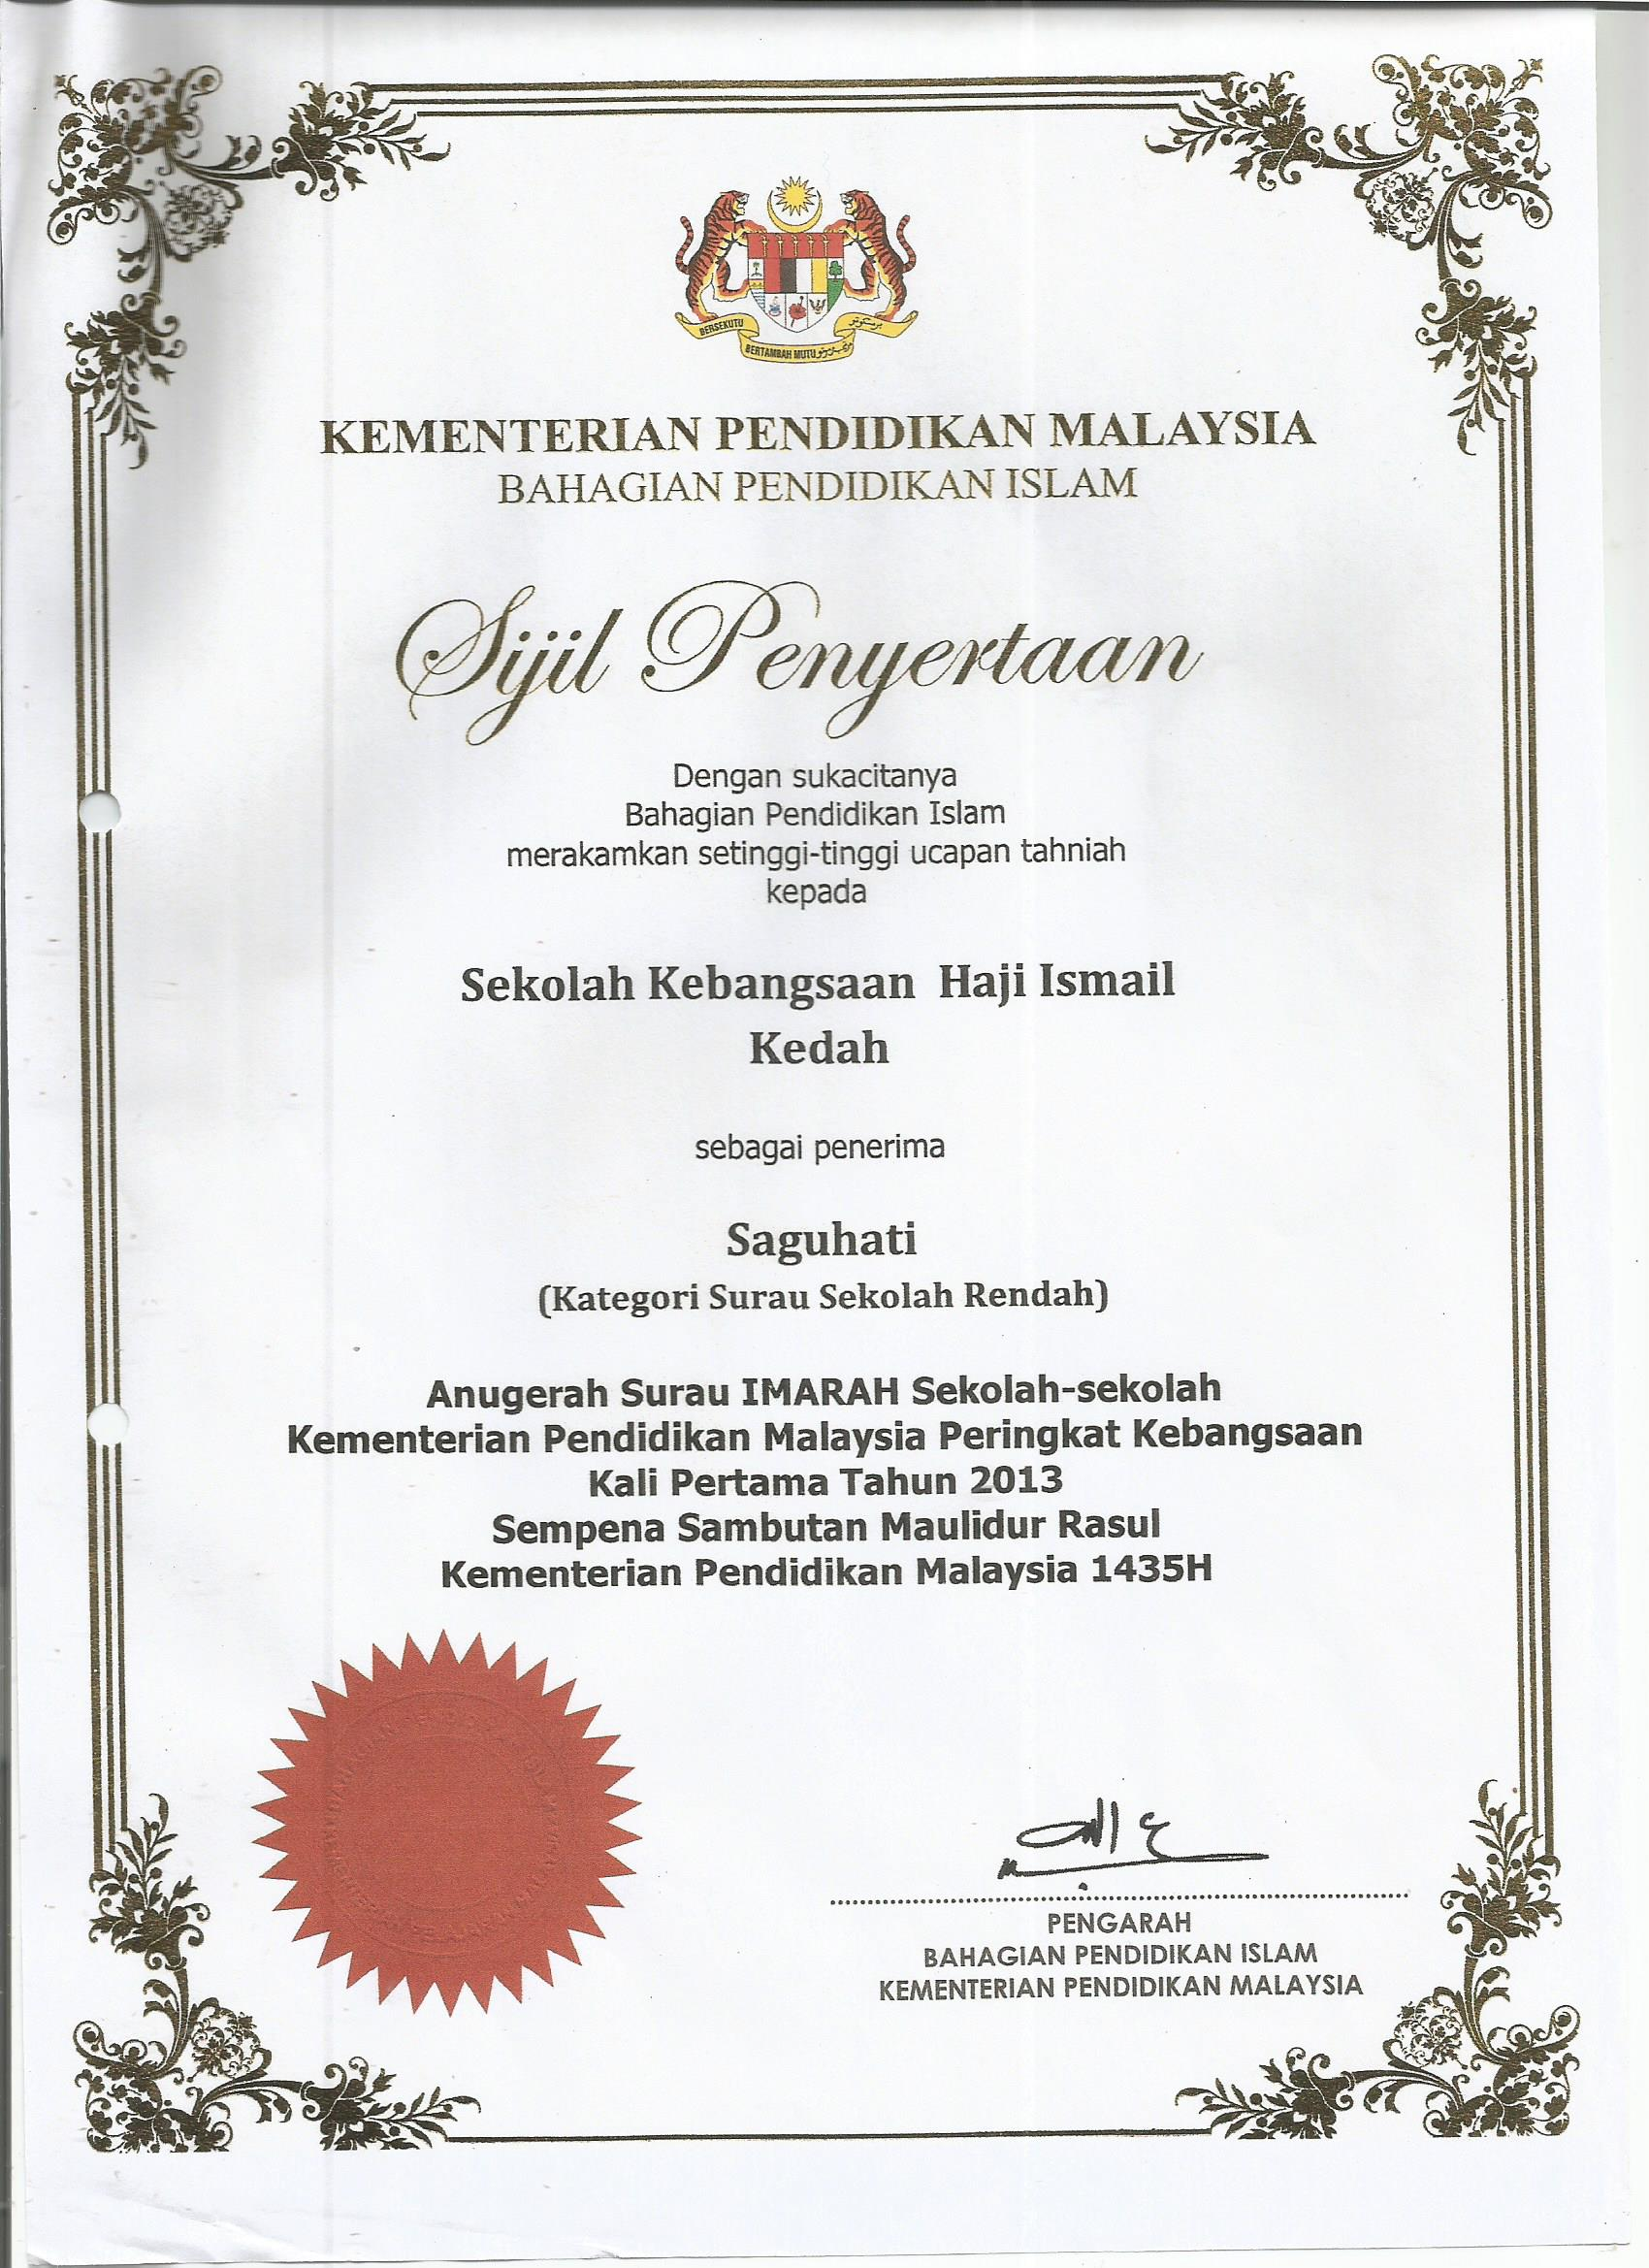 Saguhati Anugerah Surai Imarah Kebangsaan 2013